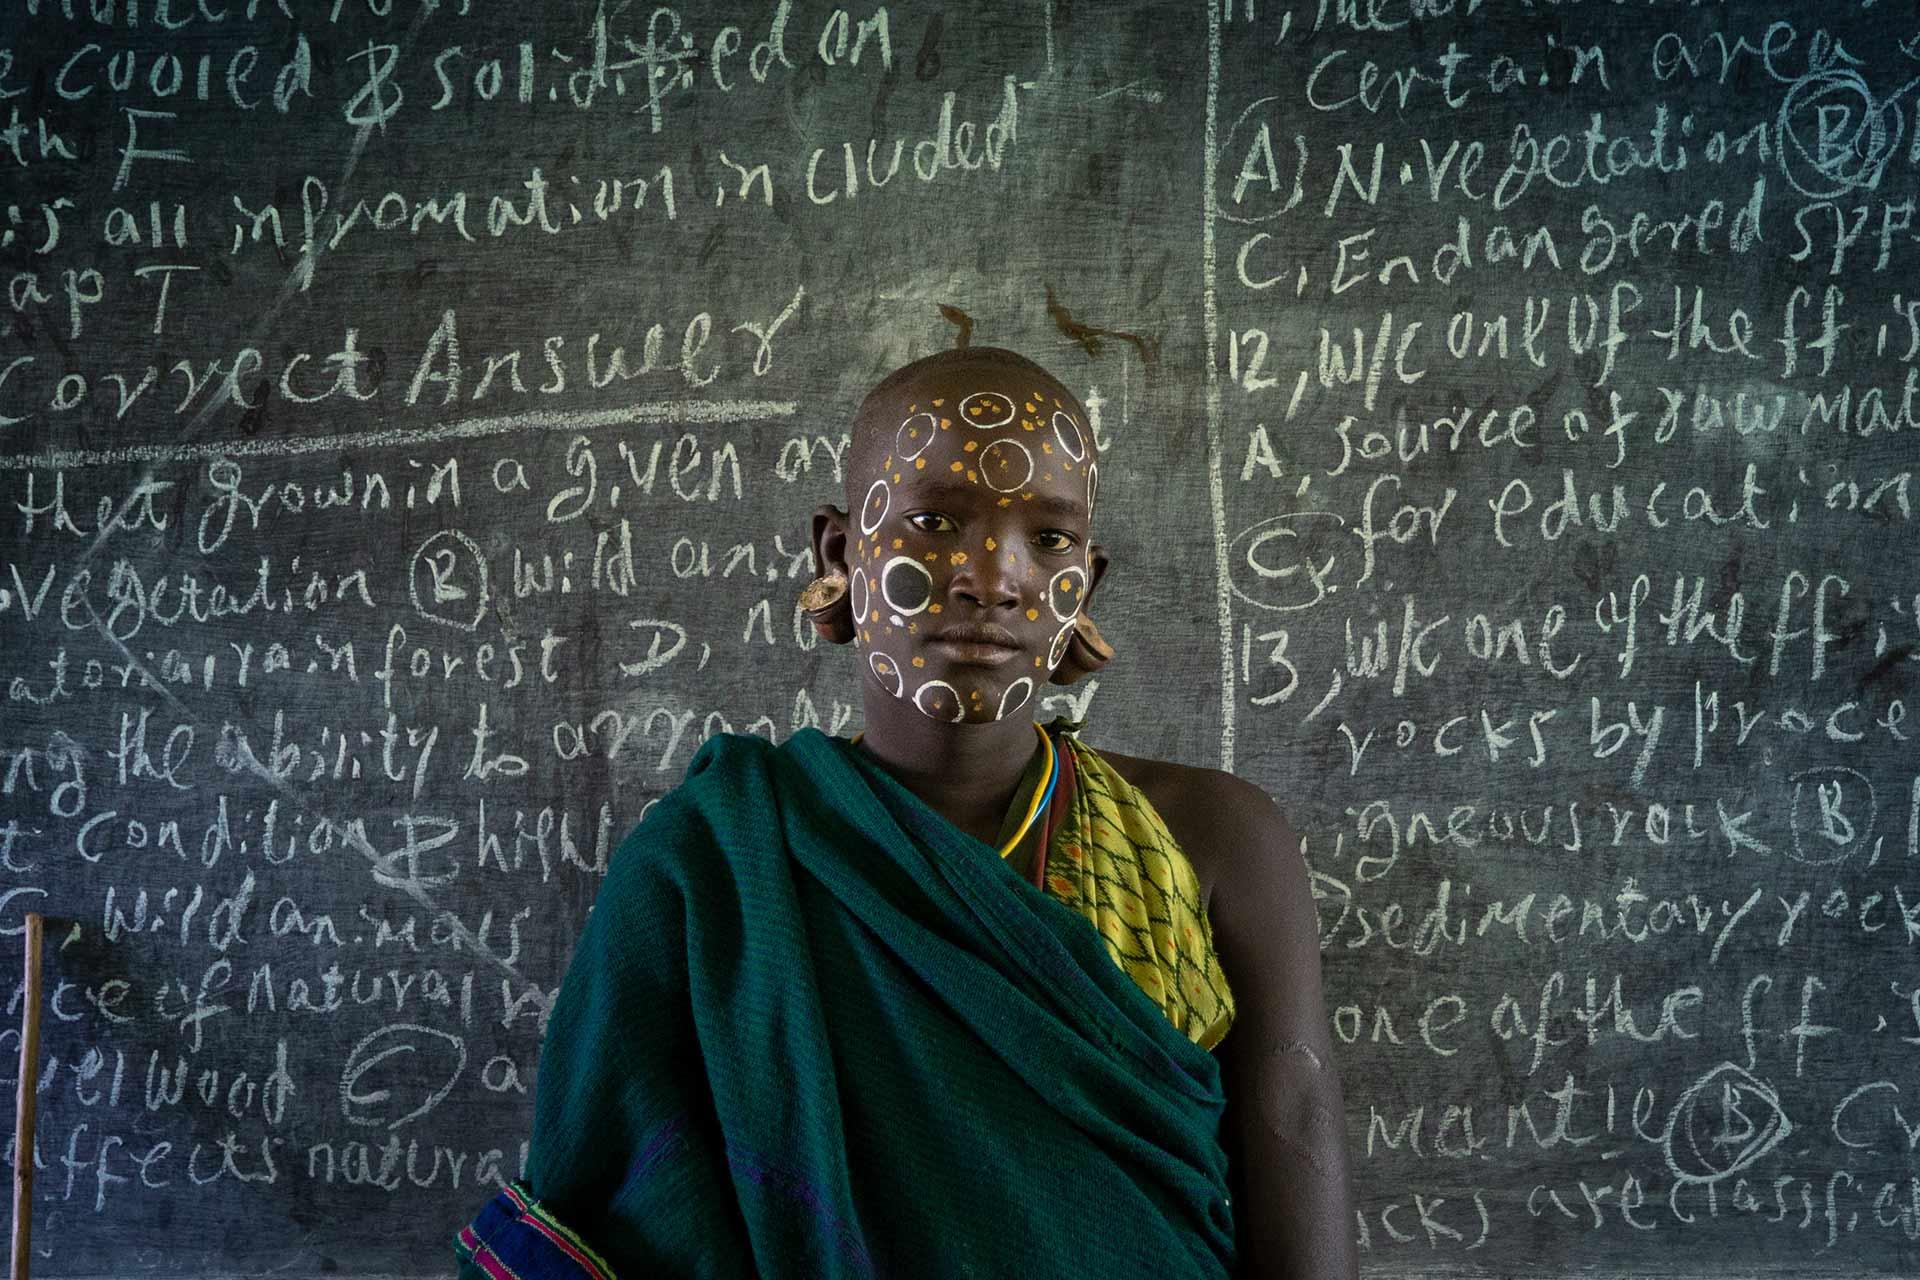 Descubre tribu ancestrales Etiopía